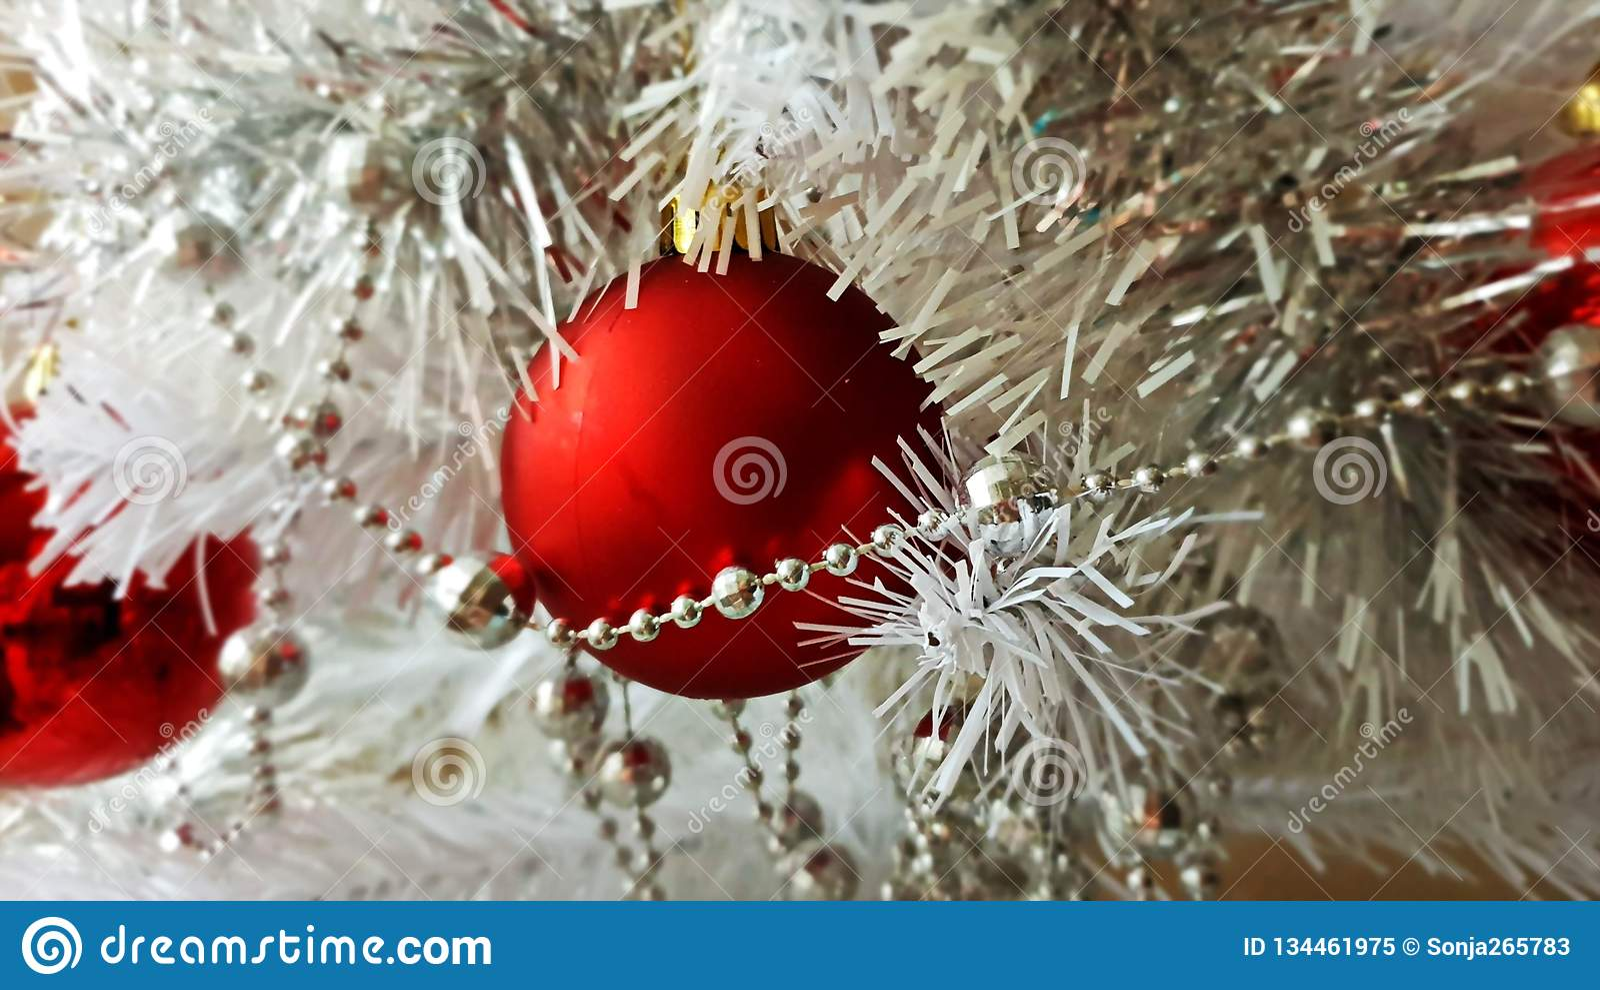 White Christmas decoration tree, red ,gold ,silver,white balls silver garland,christmas light,decoration ,illumination ideas